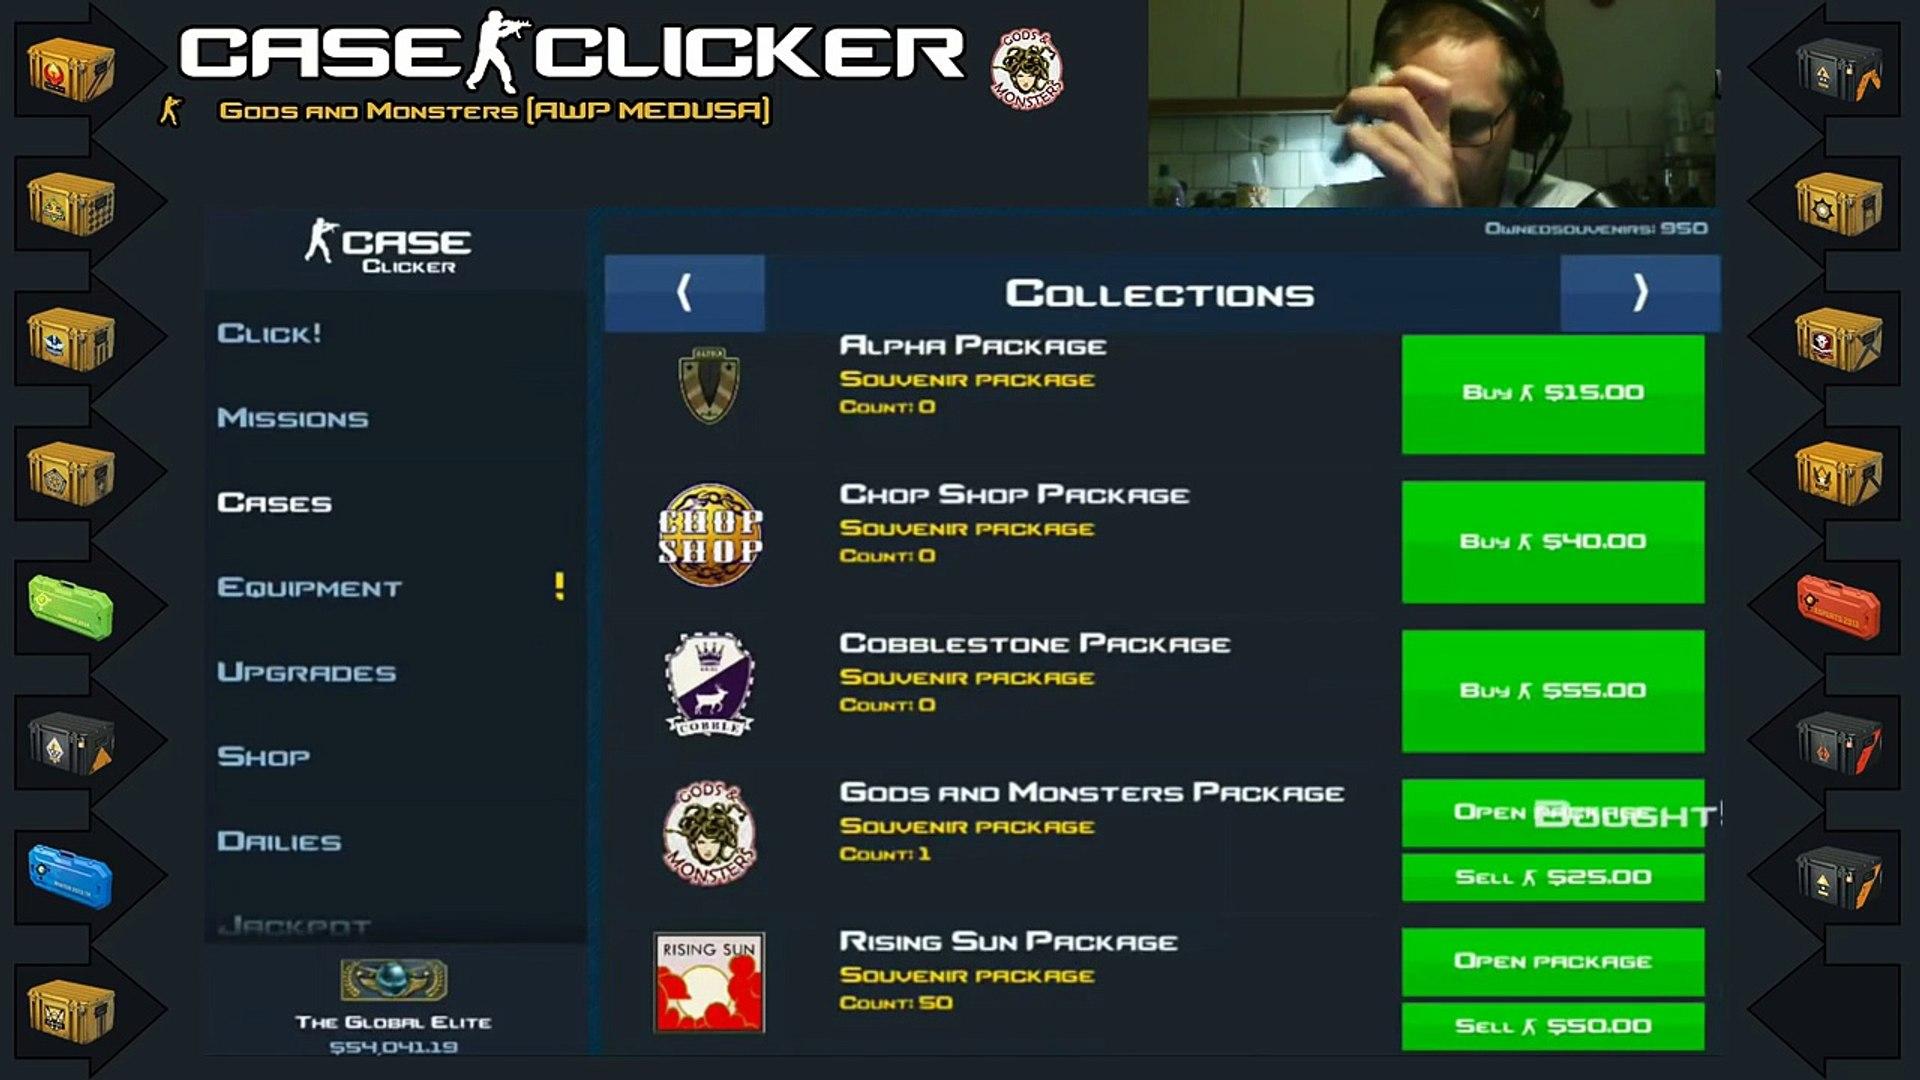 Csgo Clicker